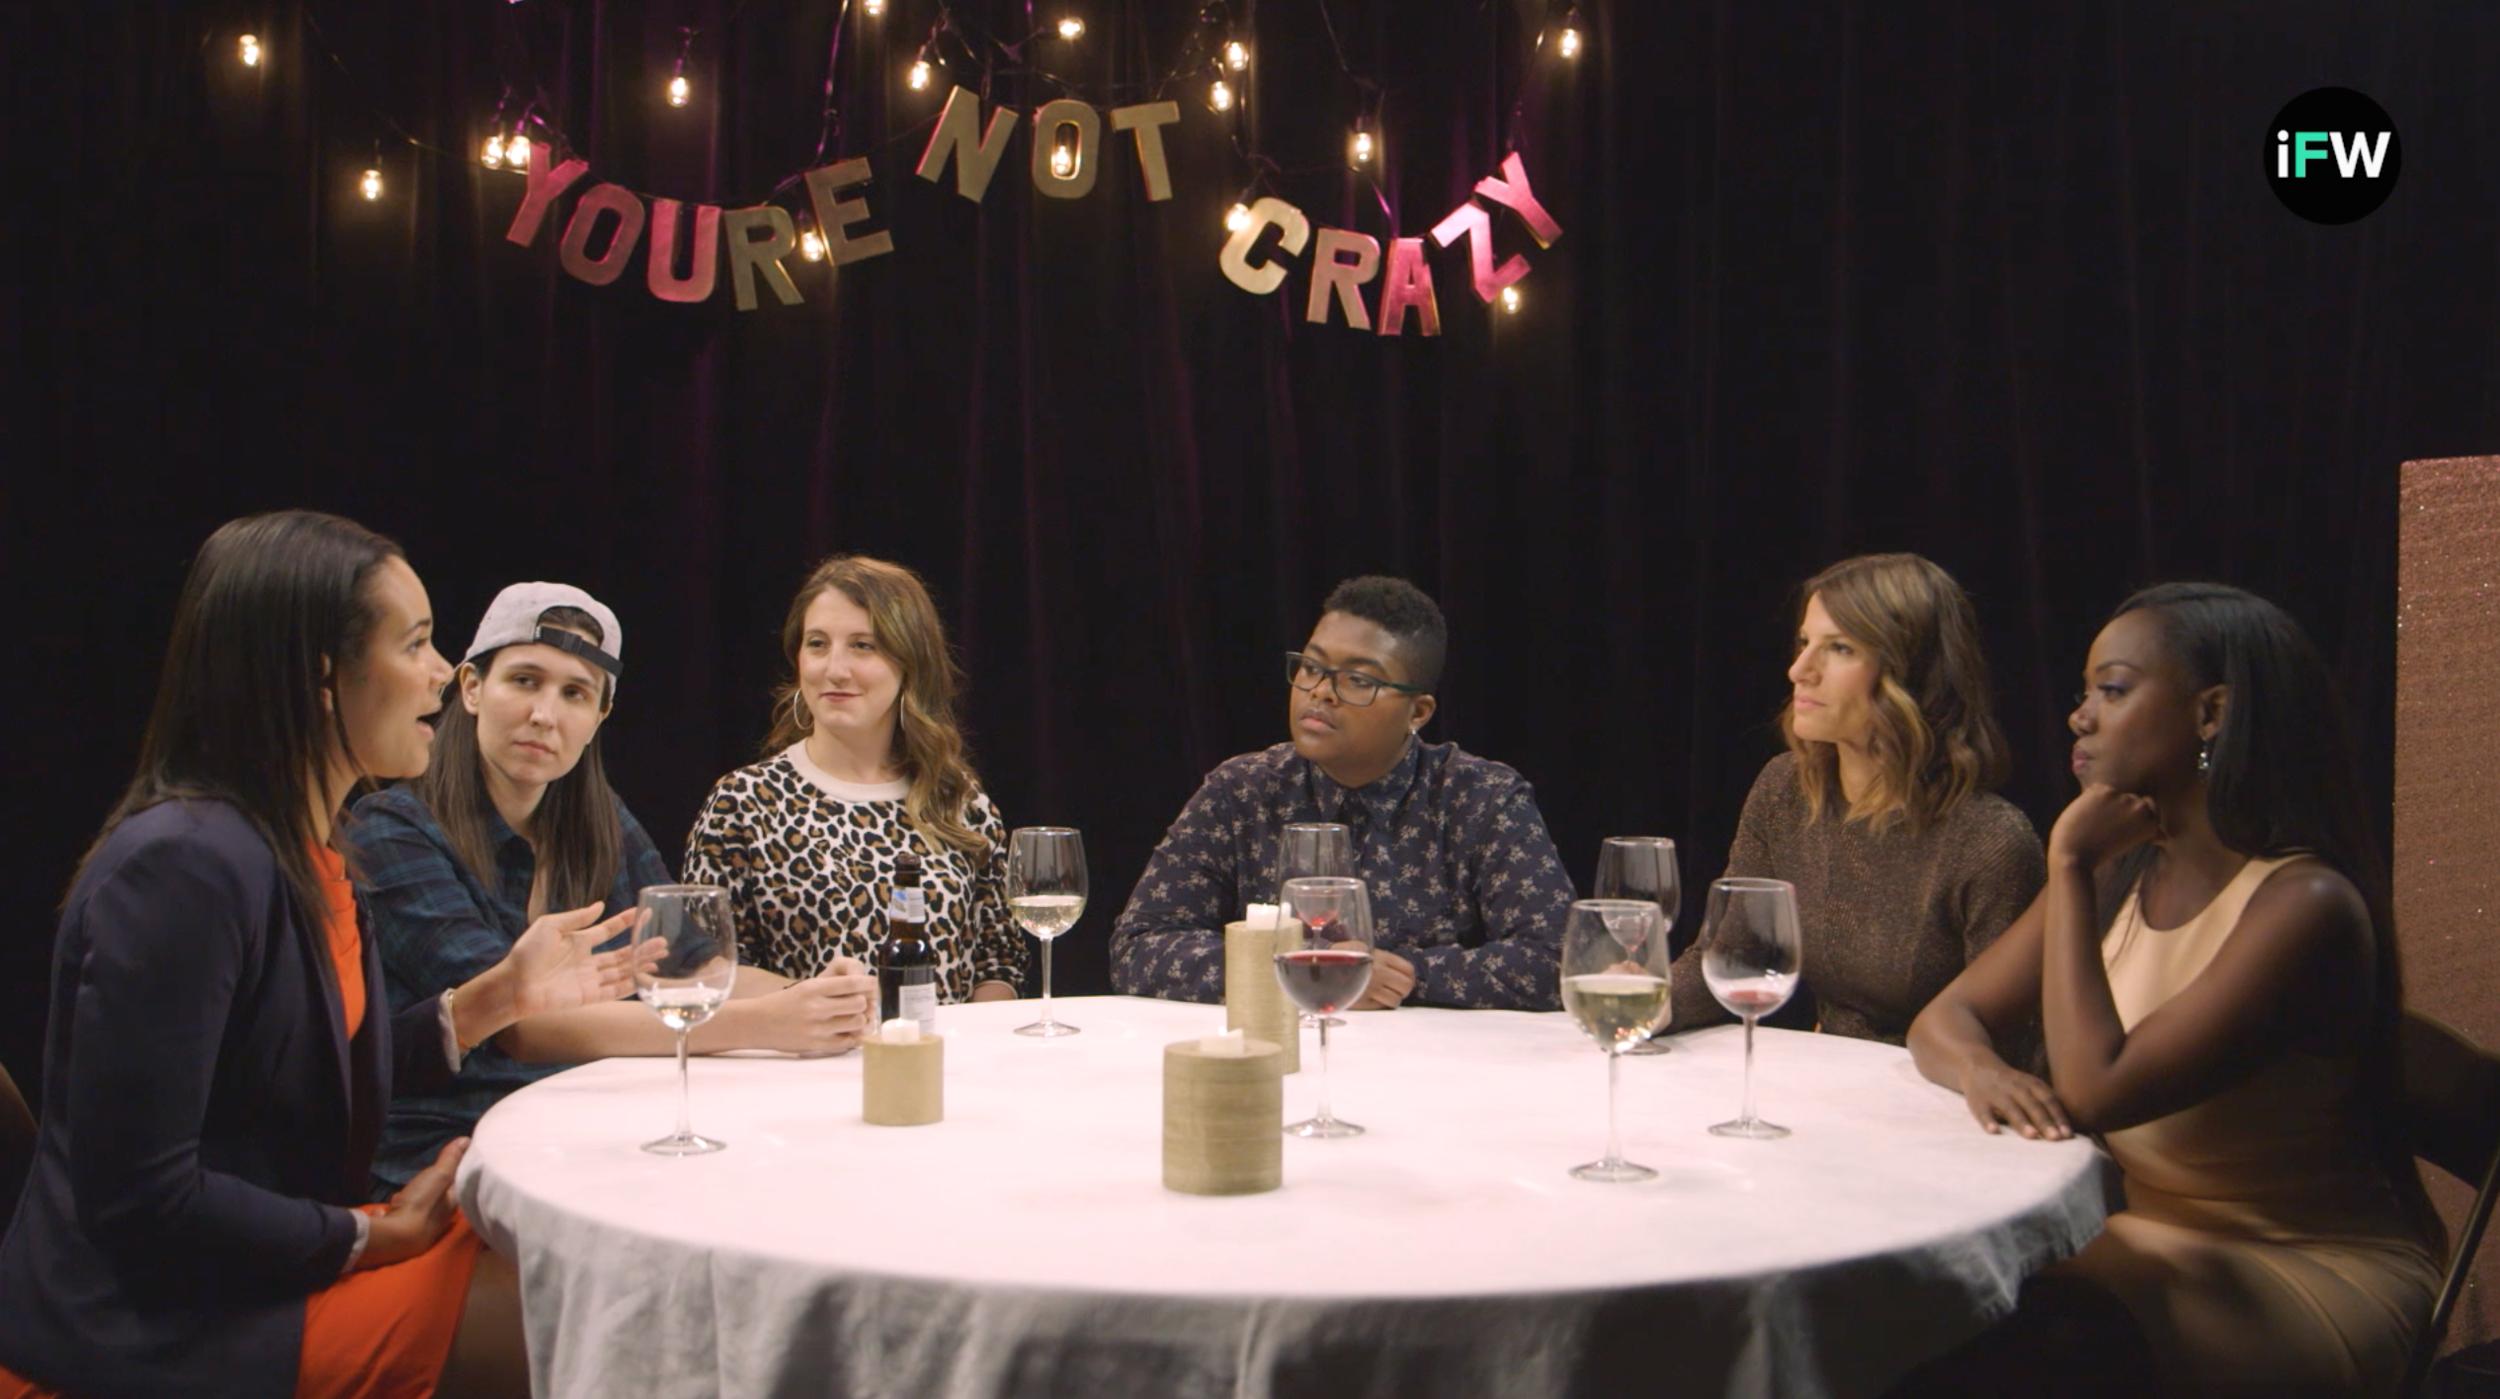 On the set of You're Not Crazy, Season Two (From left: Erica Duignan Minnihan, Ashley Gavin, Sara Armour, Sam Jay, Karen Cahn, Bea Arthur)